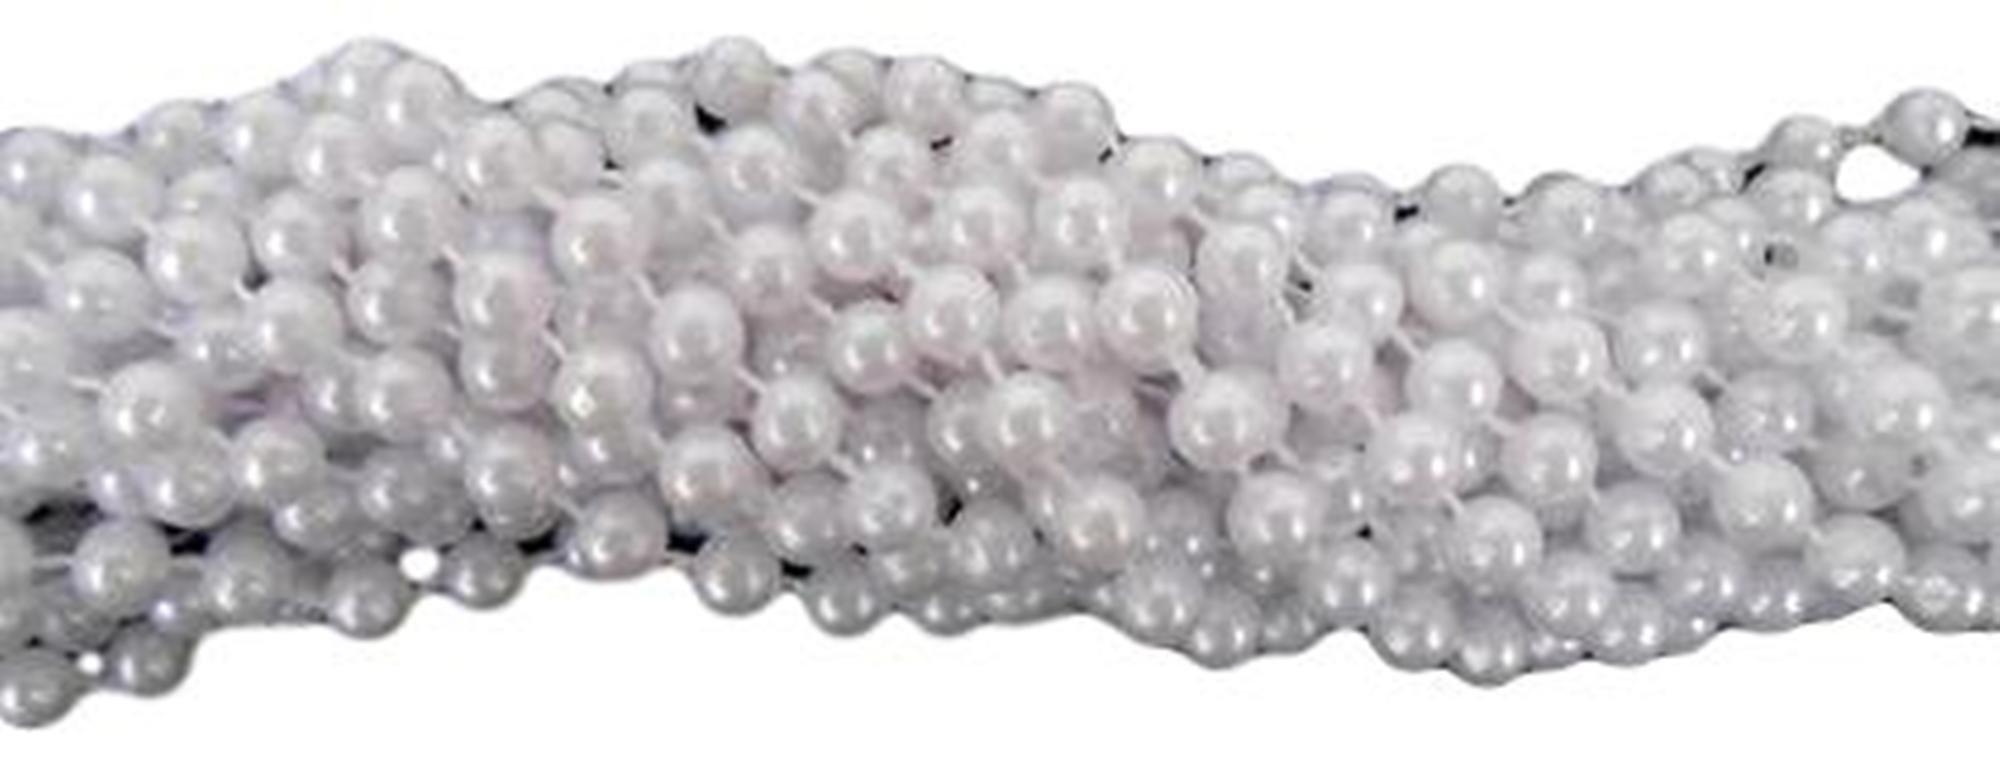 33 inch 7.5mm Round Pearl White Mardi Gras Beads - 6 Dozen (72 necklaces) by Mardi Gras Spot (Image #1)